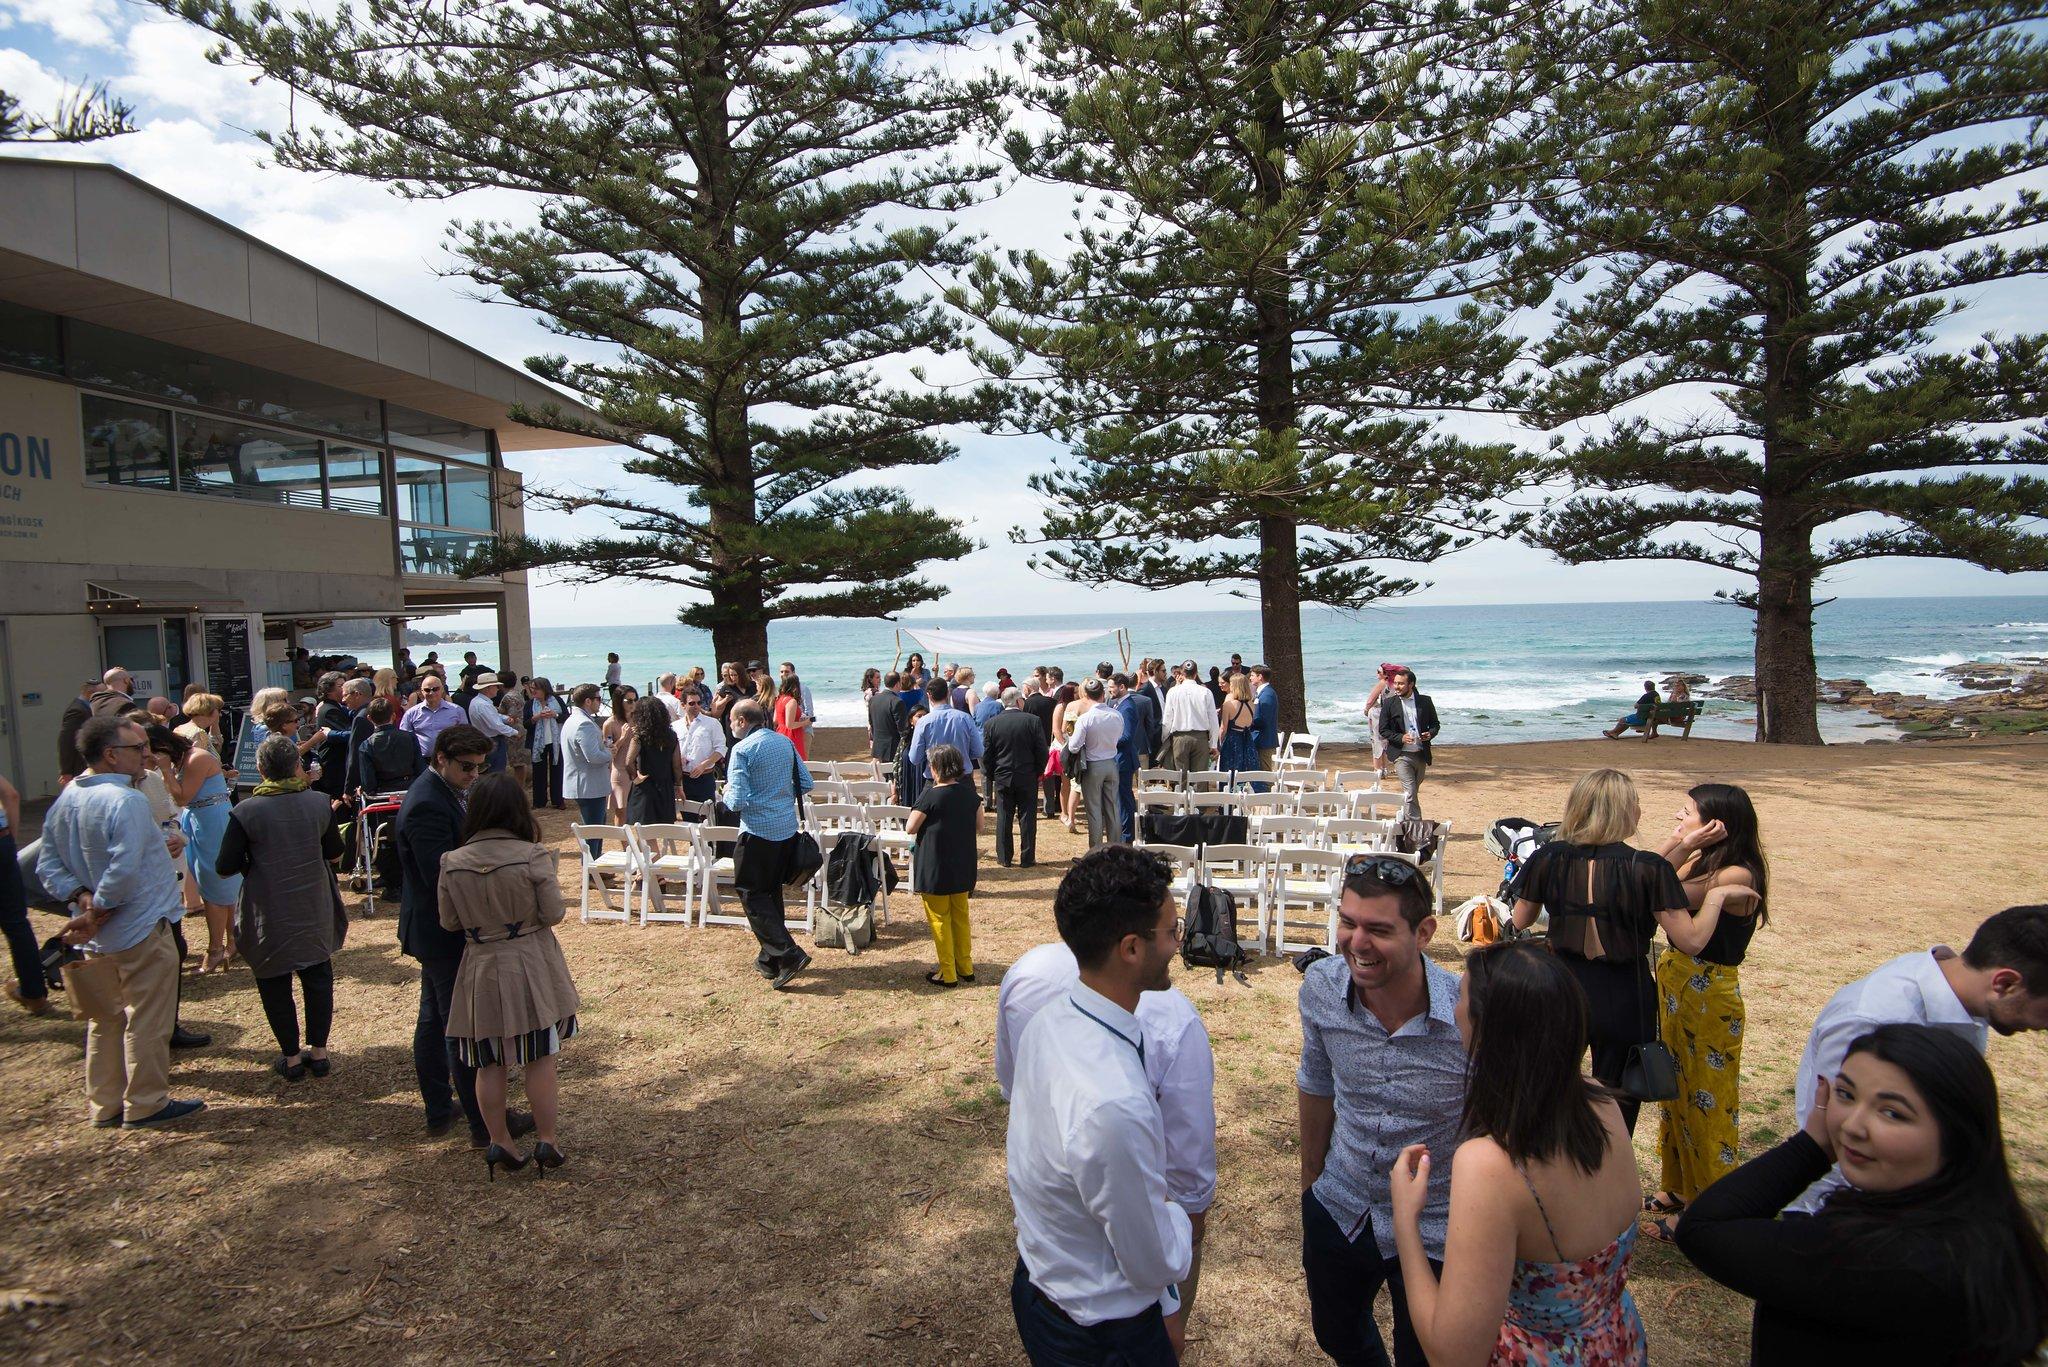 Avalon_Beach_Wedding_Ceremony.jpg